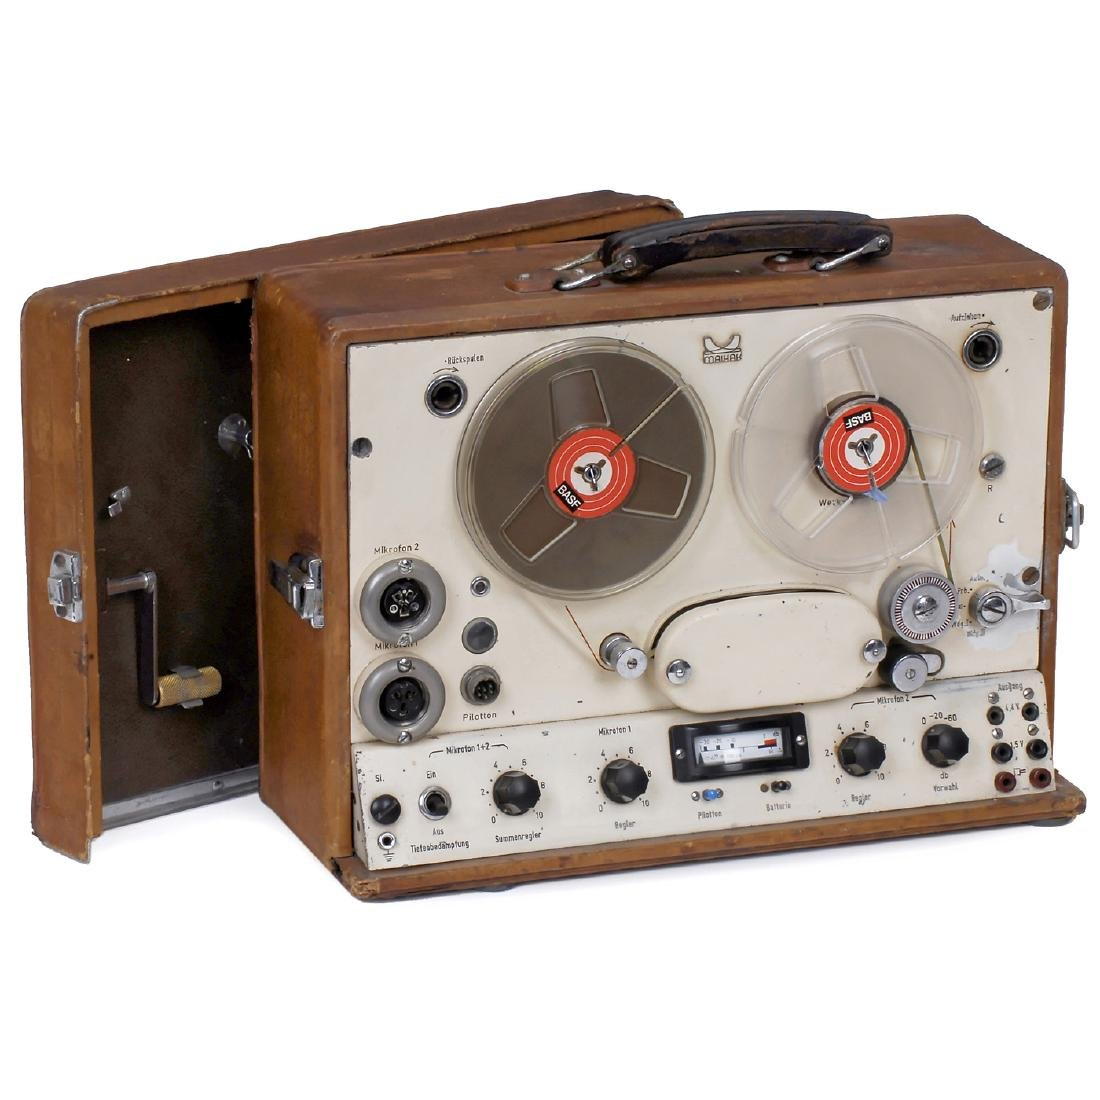 Maihak MMK6 Pilottone Tape Recorder, c. 1960